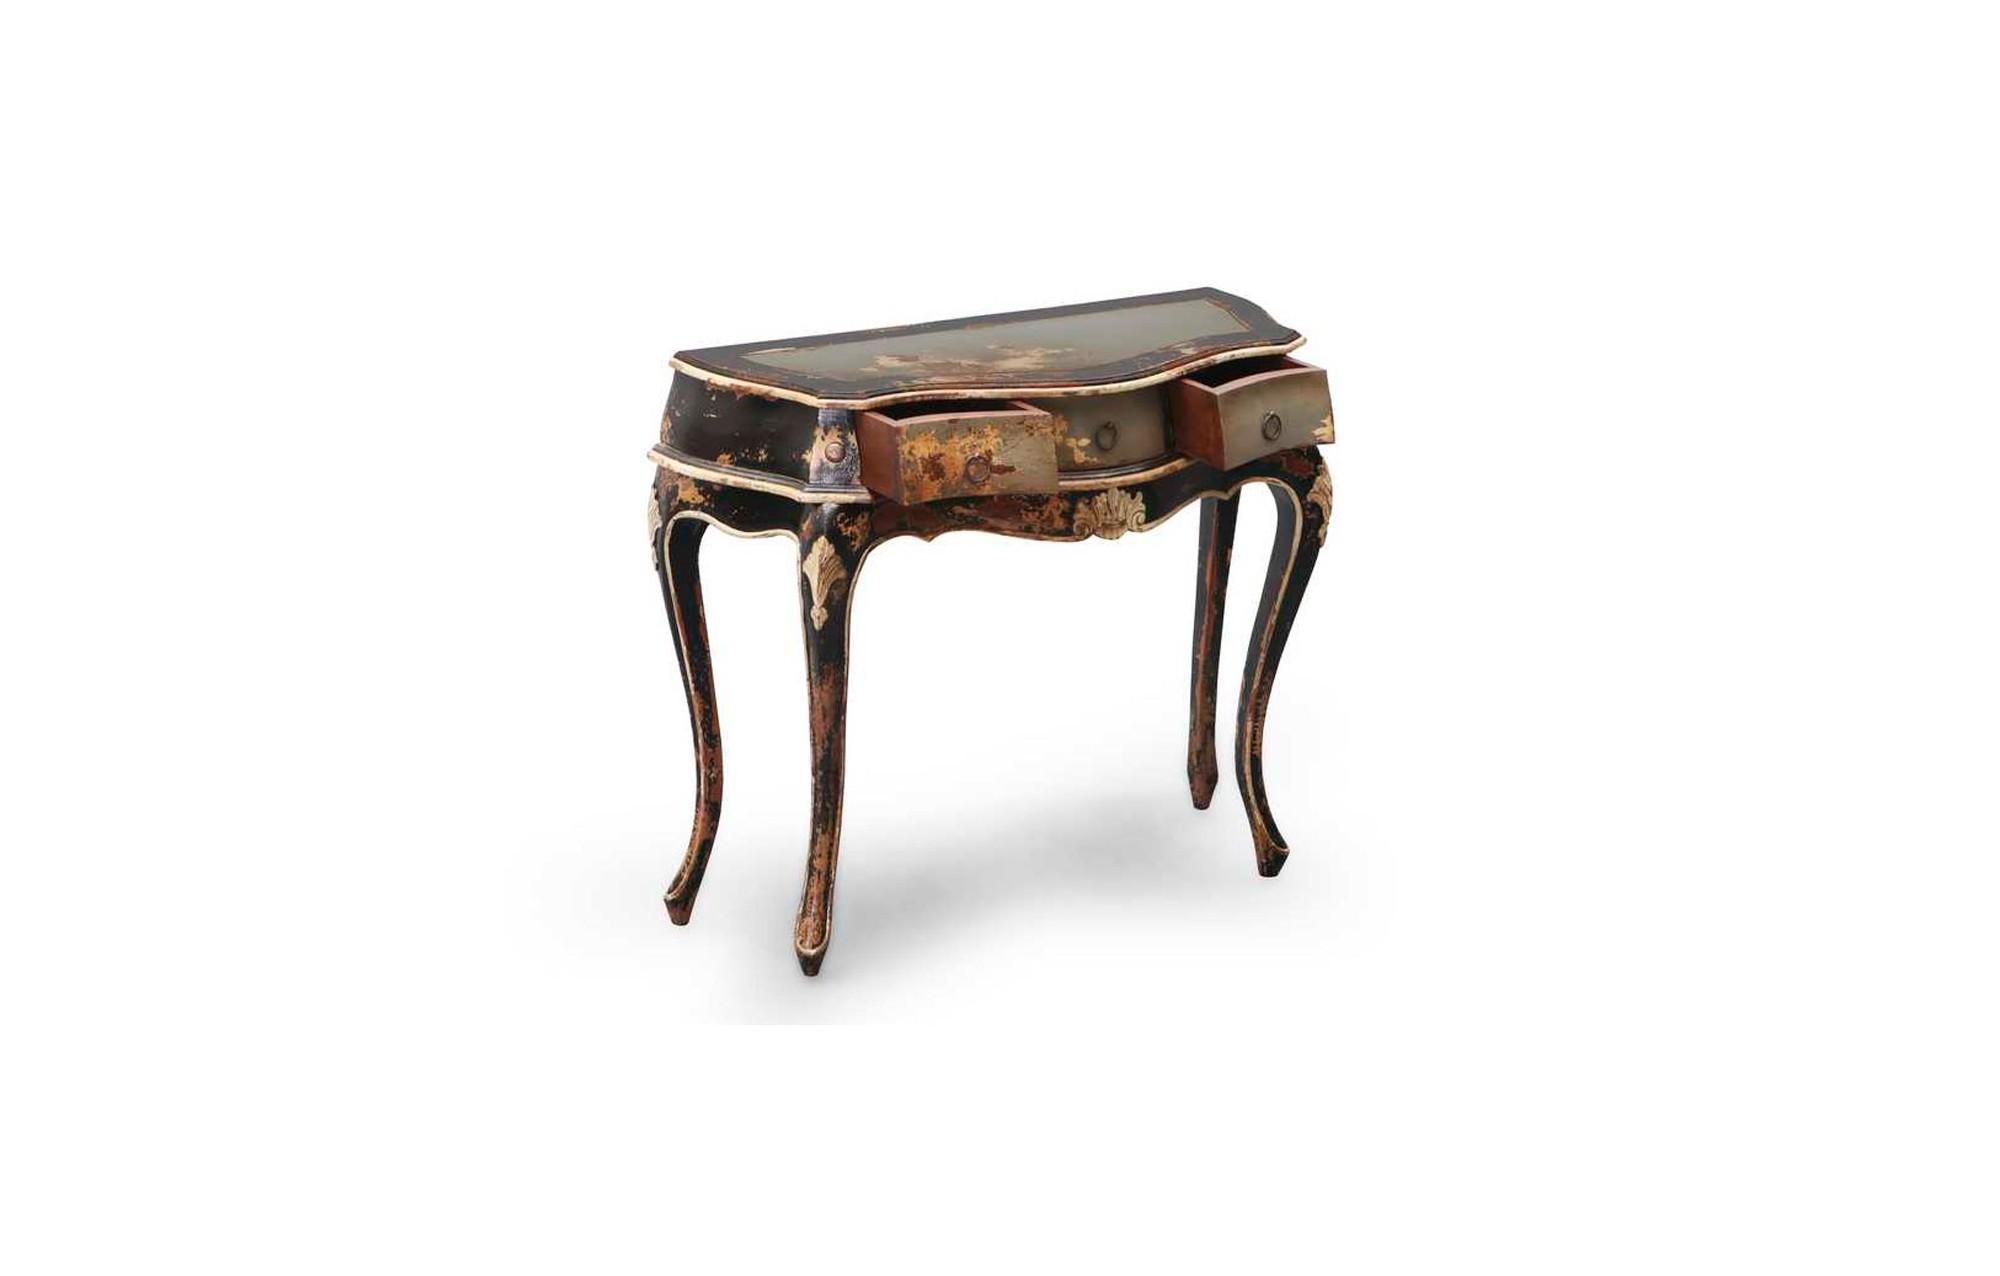 http://teck-in-home.com/1877-thickbox_gbm/commode-vintage-aspect-ancien-en-bois-avec-3-tiroirs.jpg